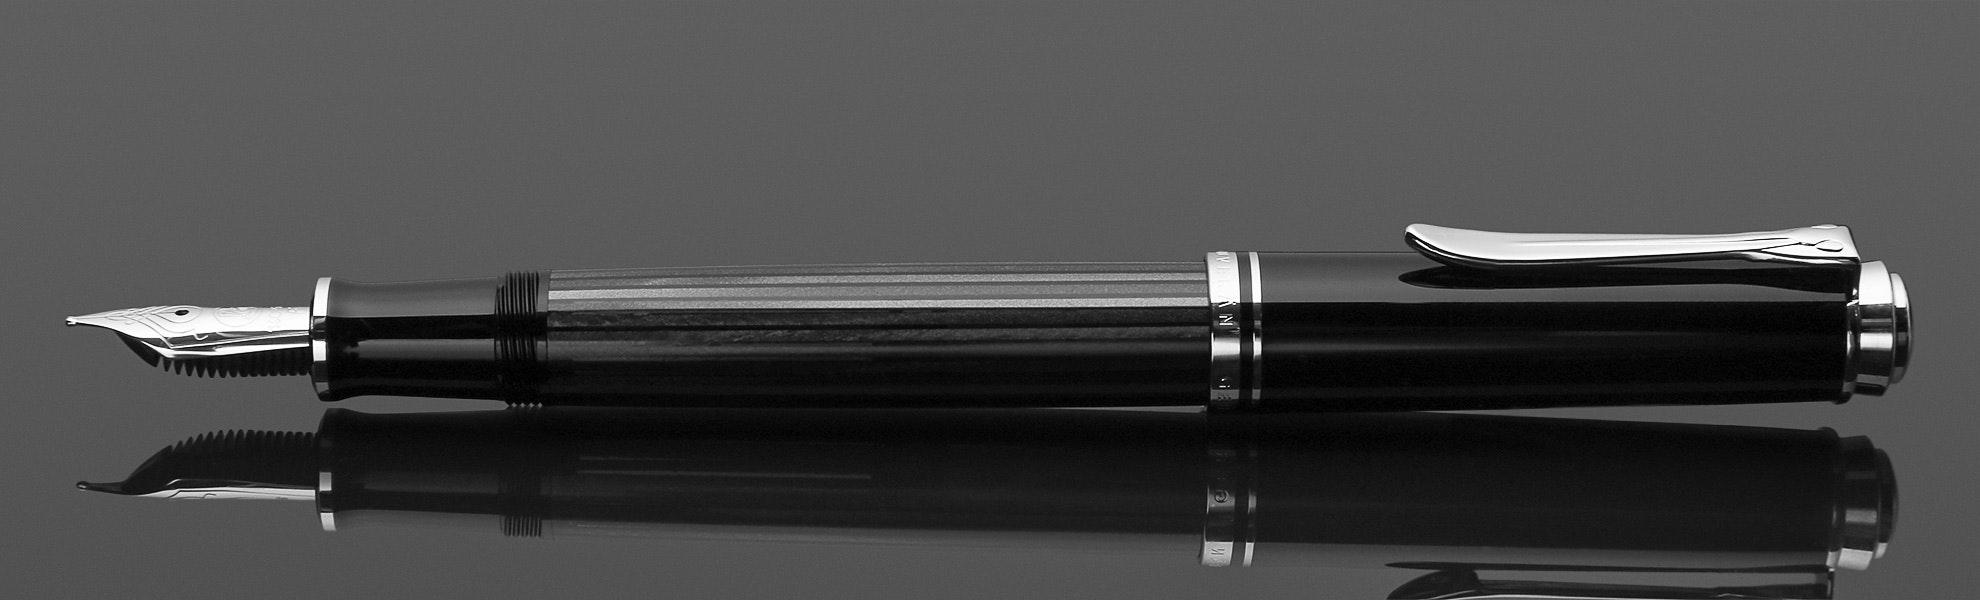 Pelikan Souverän M405 Stresemann